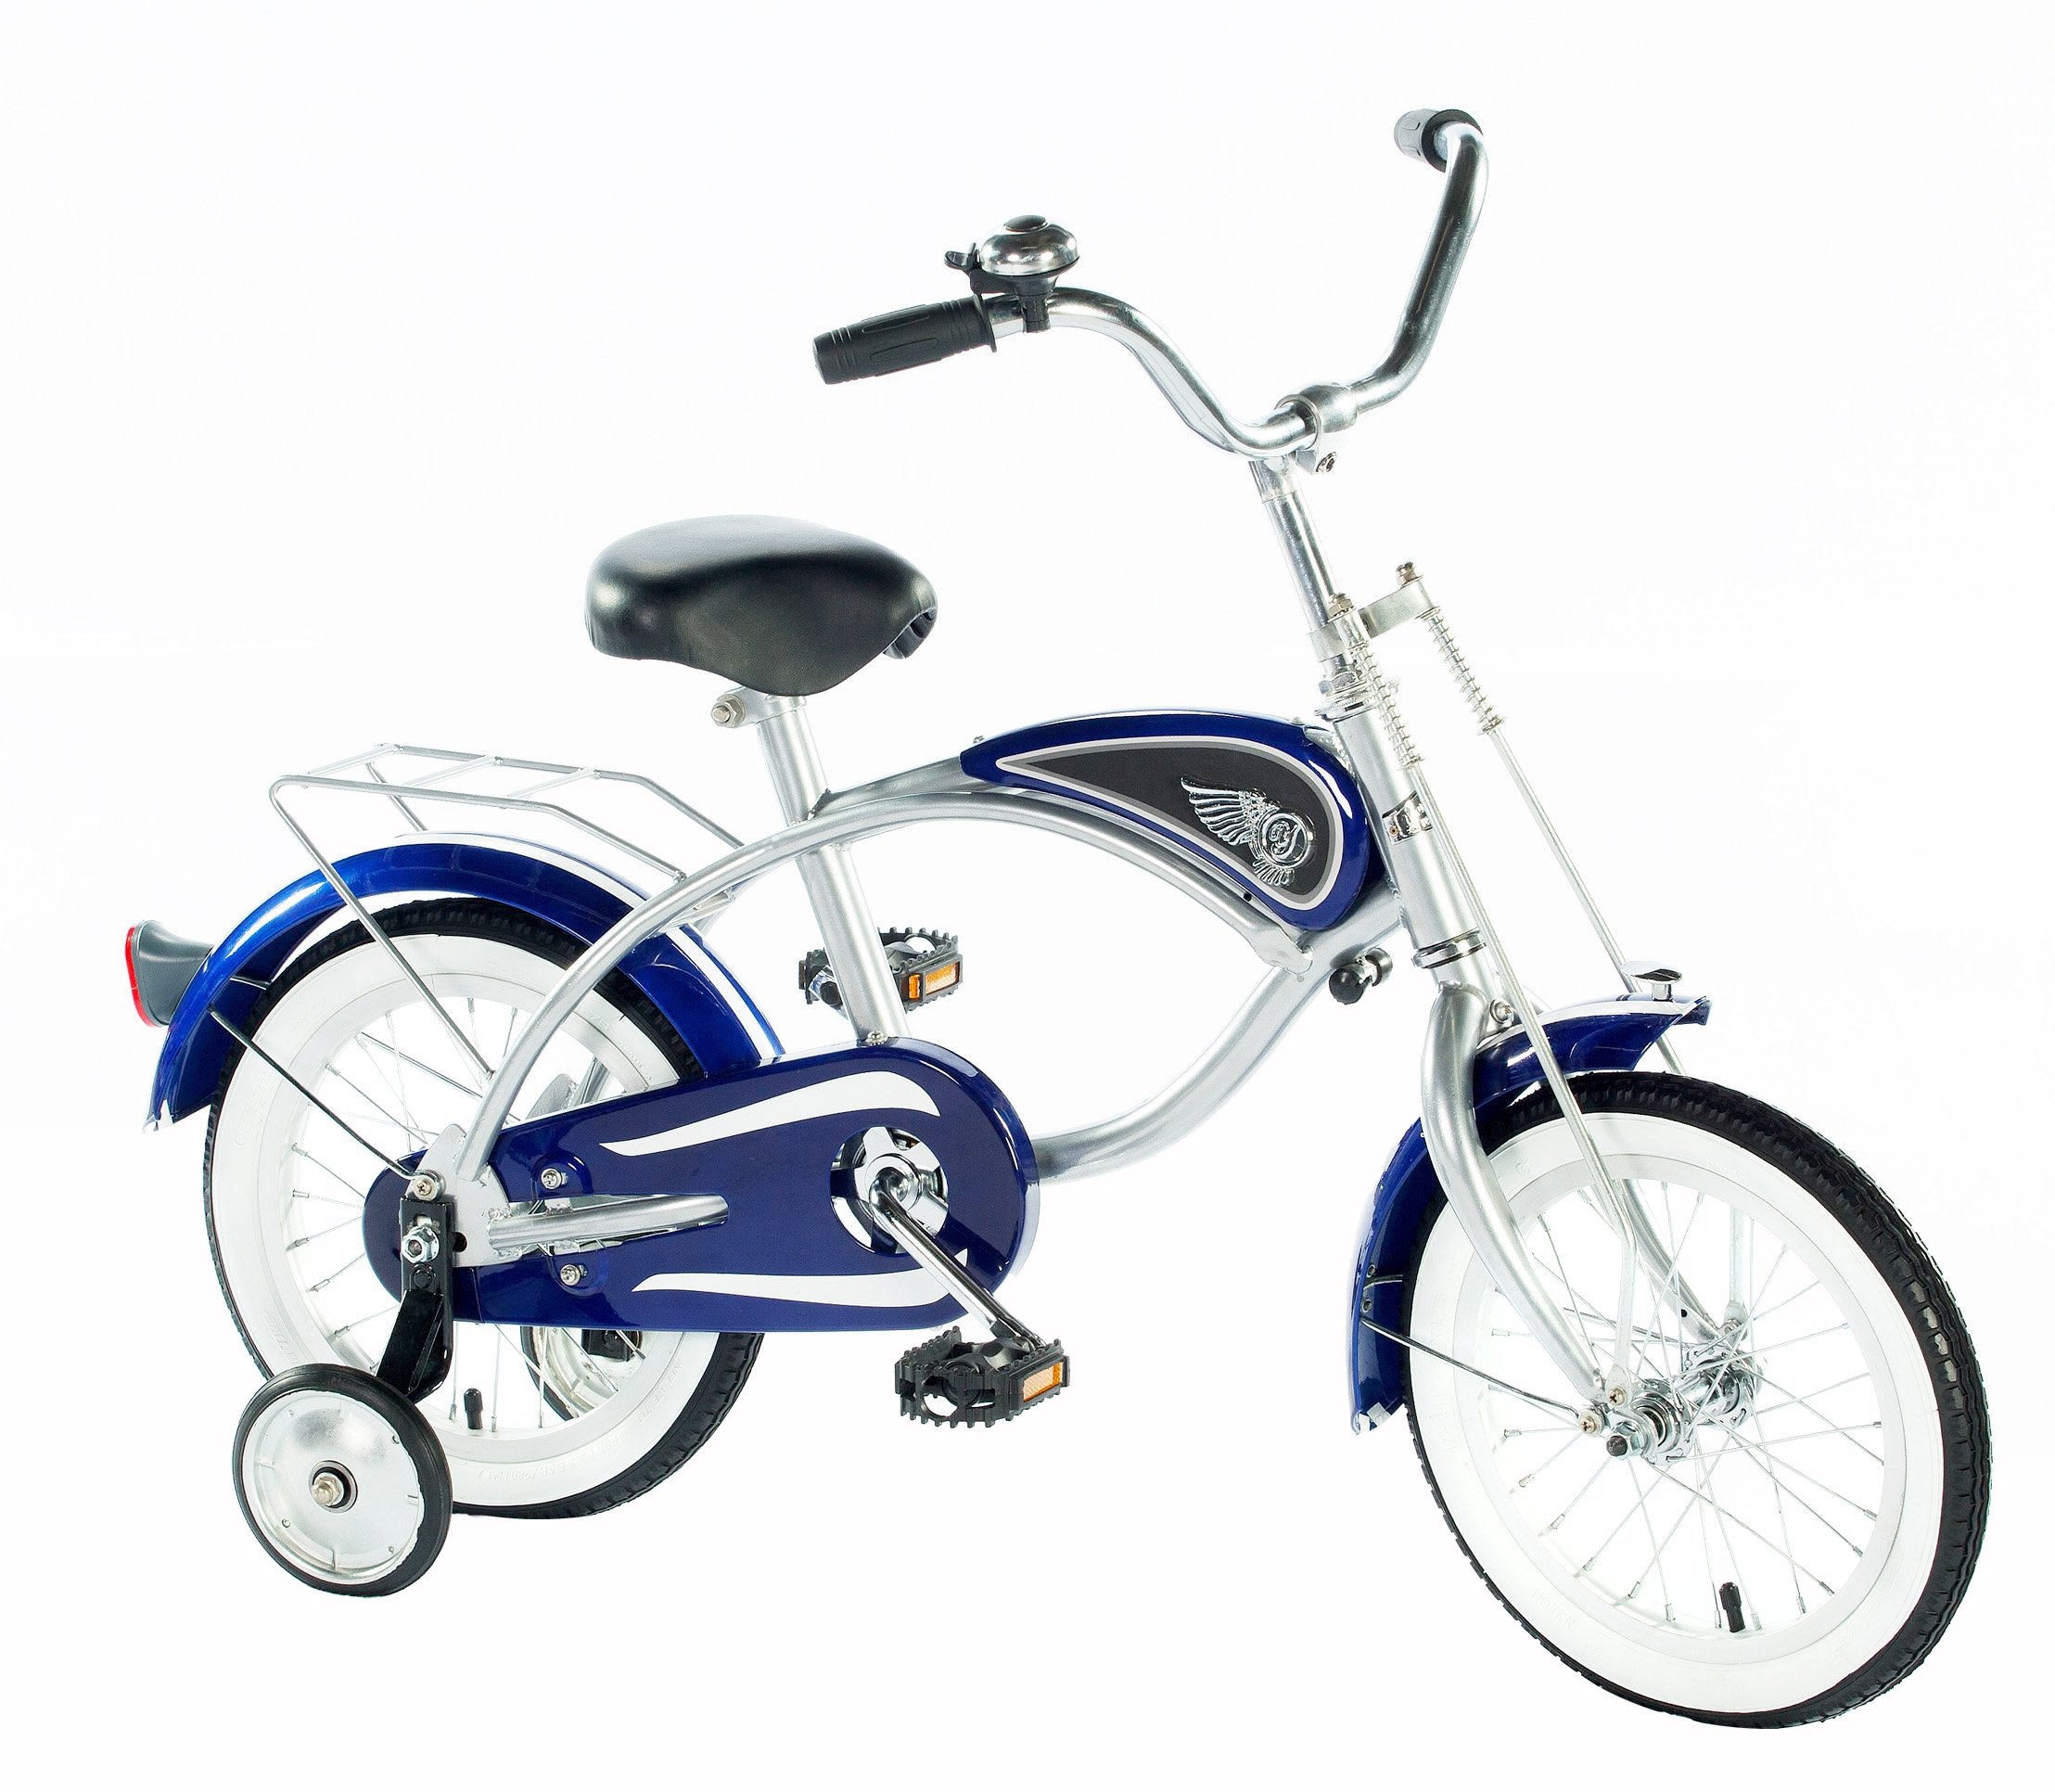 14 Cruiser Bicycle With Training Wheels Blue Toddler Bike Retro